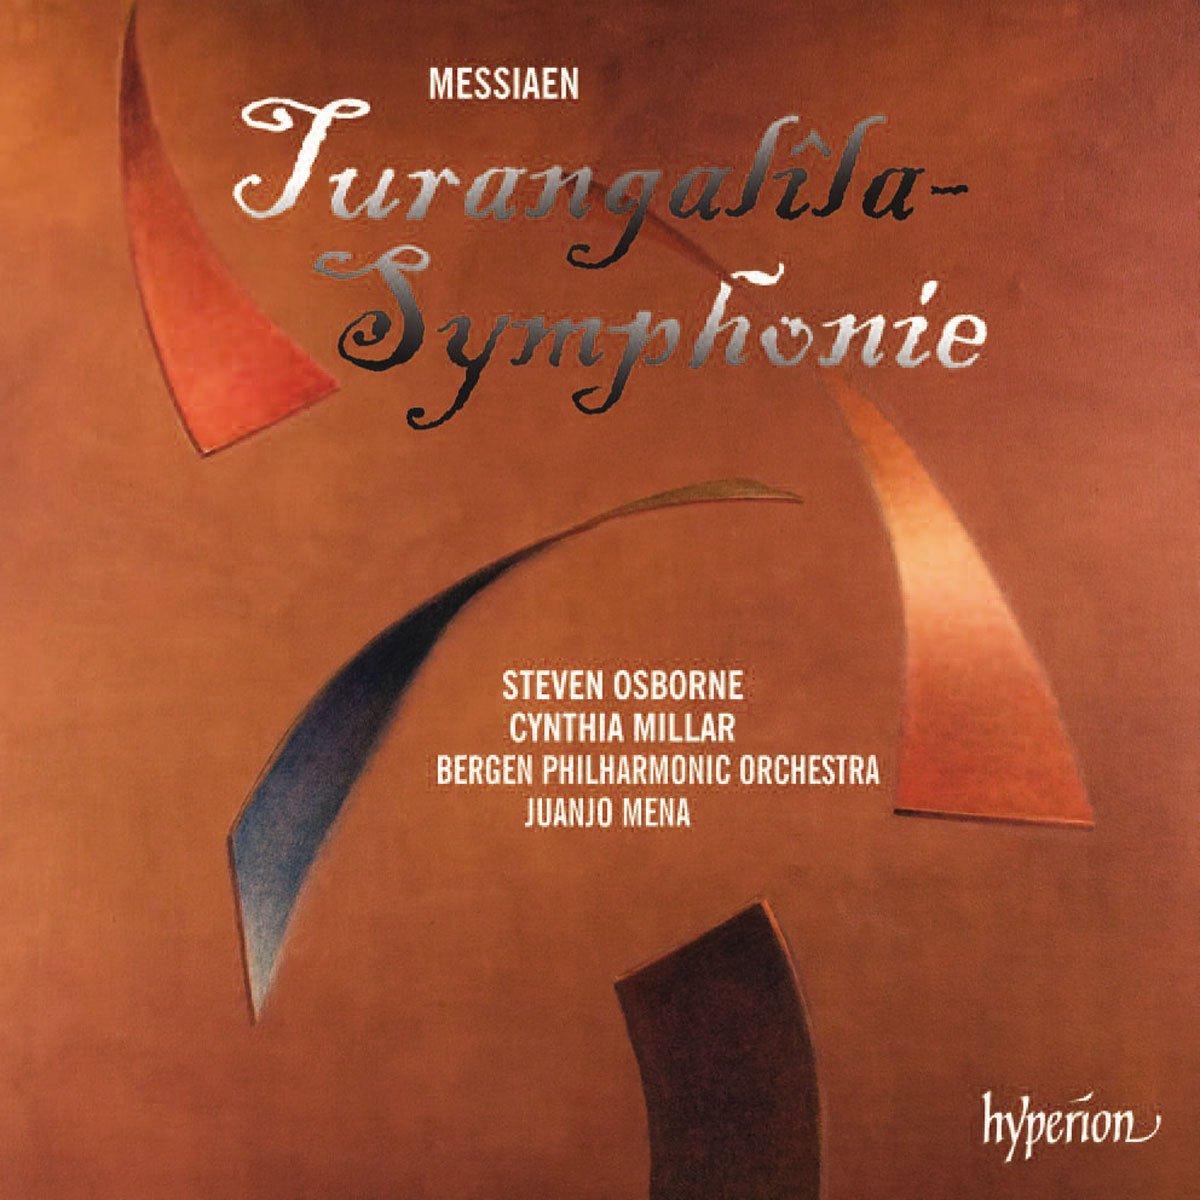 Messiaen - Turangalîla-Symphonie - Page 3 71KgK55m-YL._SL1200_